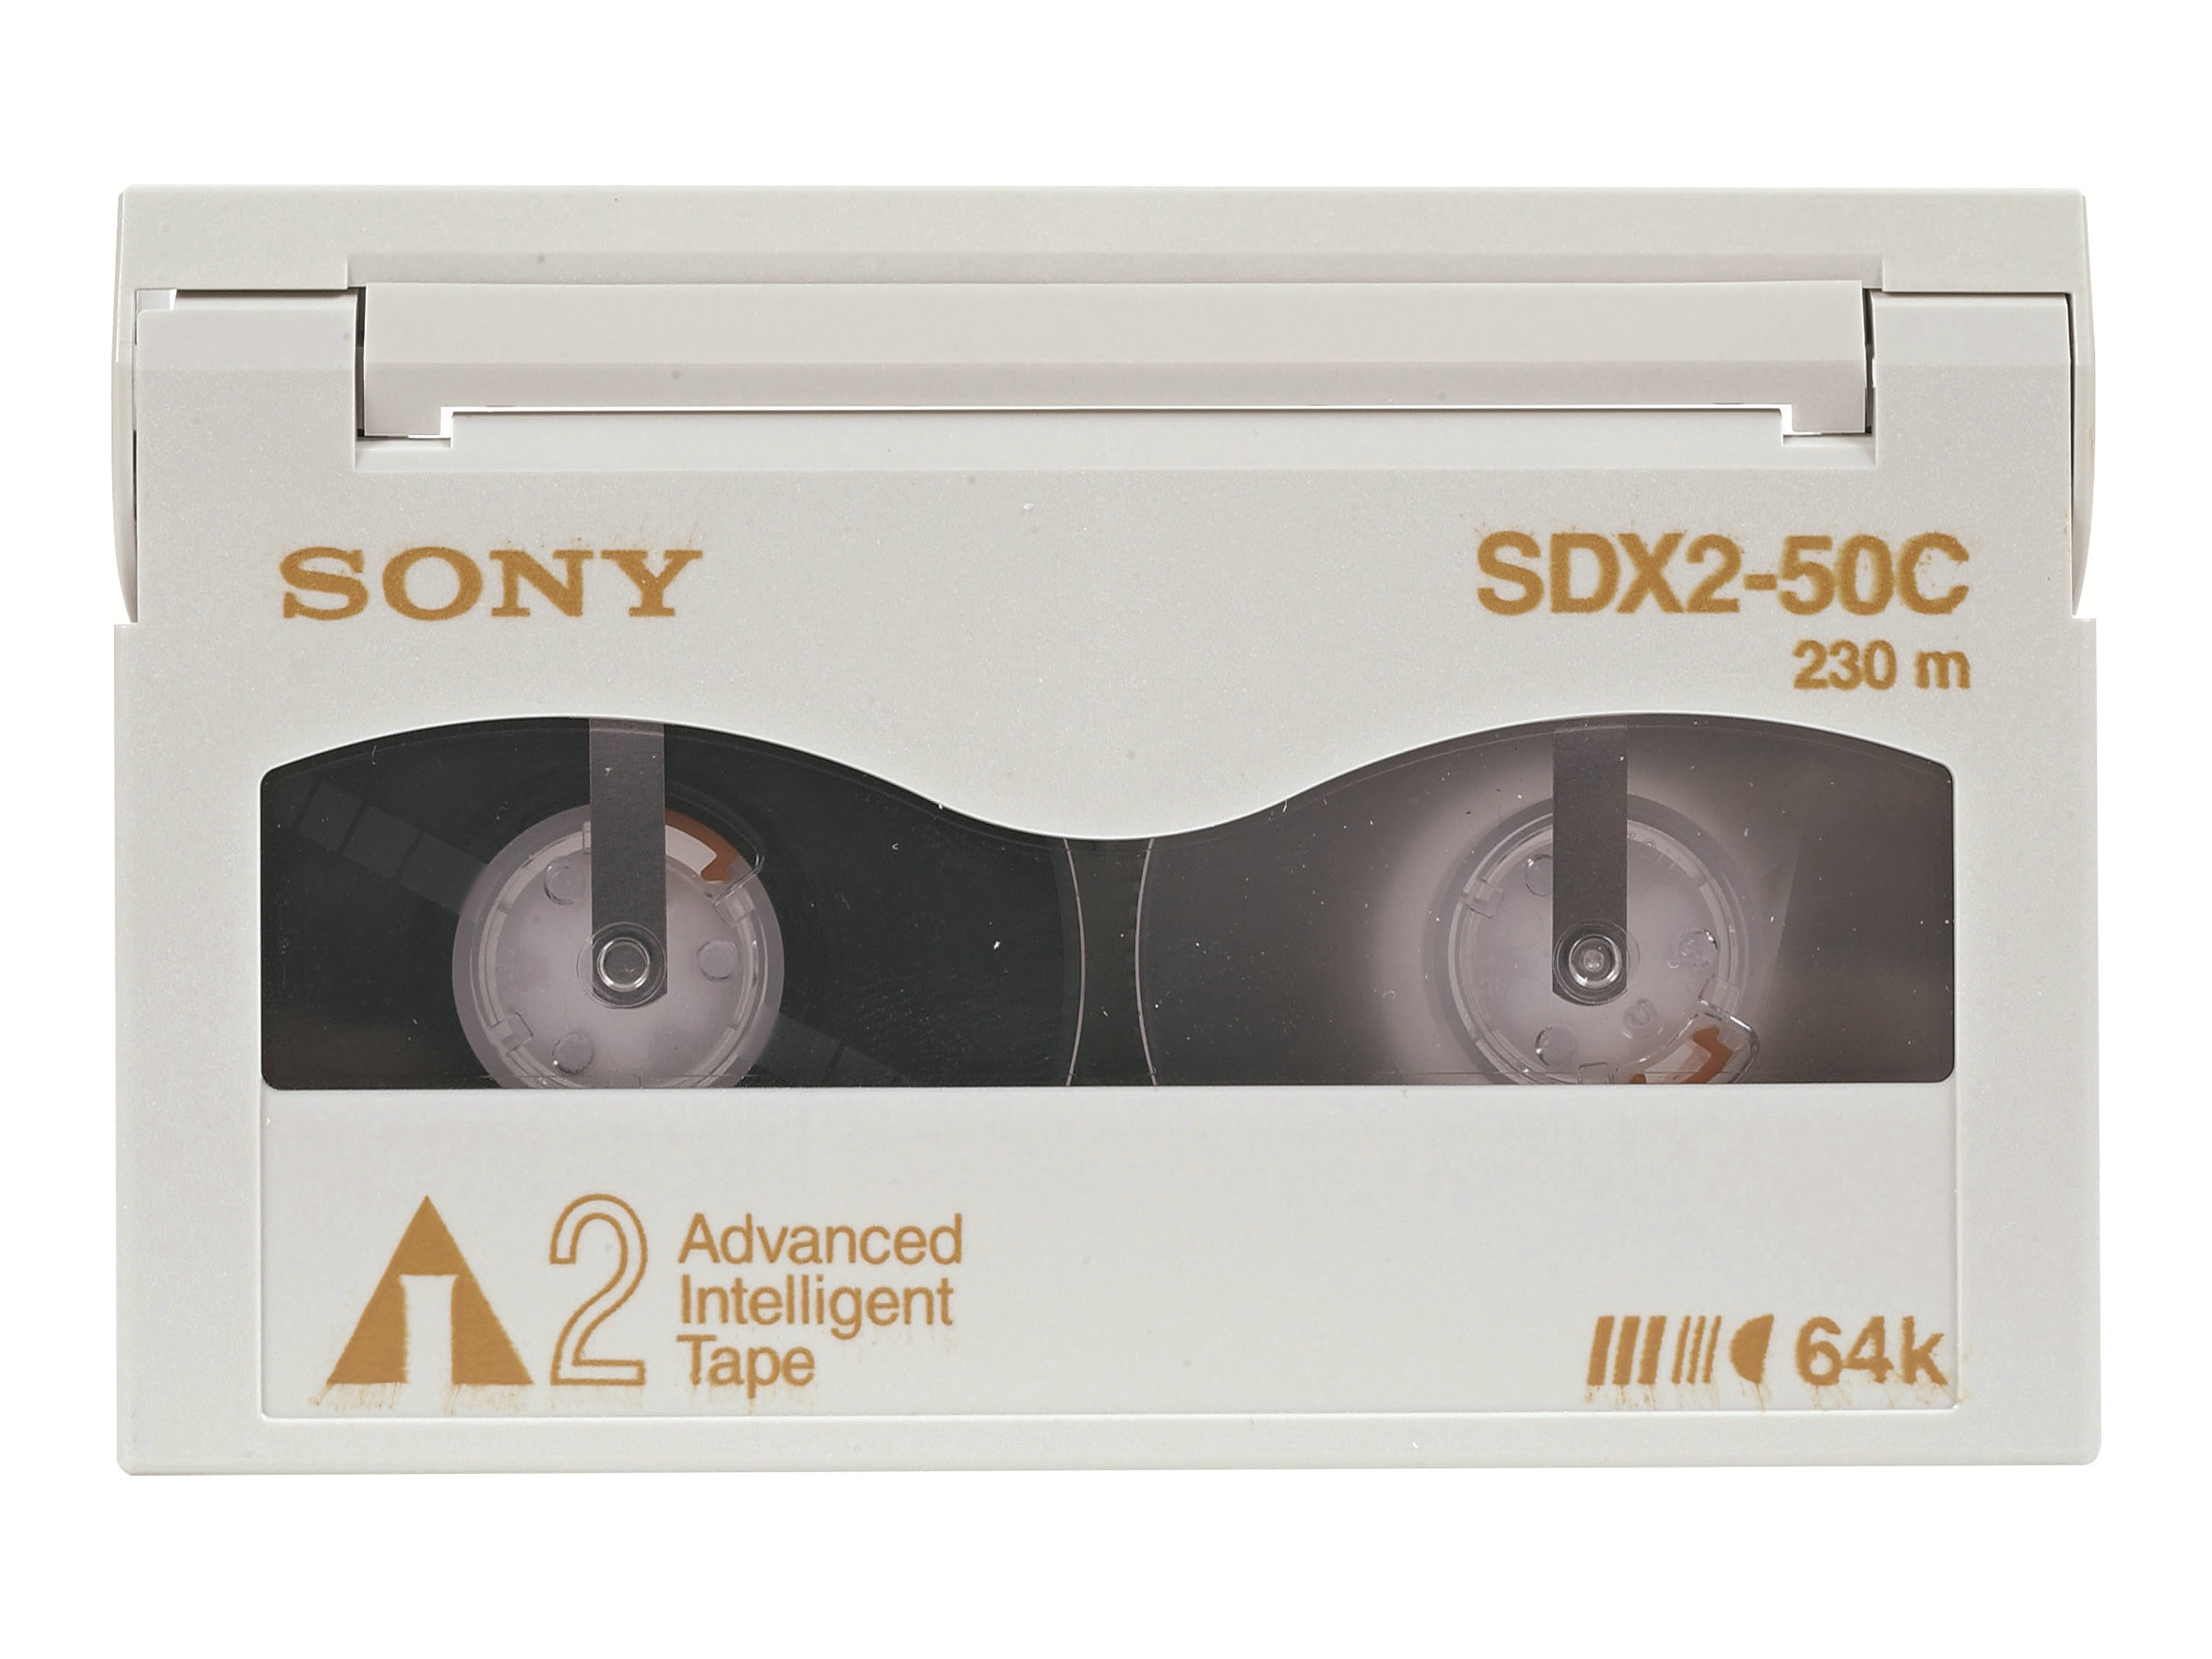 Sony 50 100GB AIT-2 8mm 230m Data Cartridge, SDX-250C, 154031, Tape Drive Cartridges & Accessories